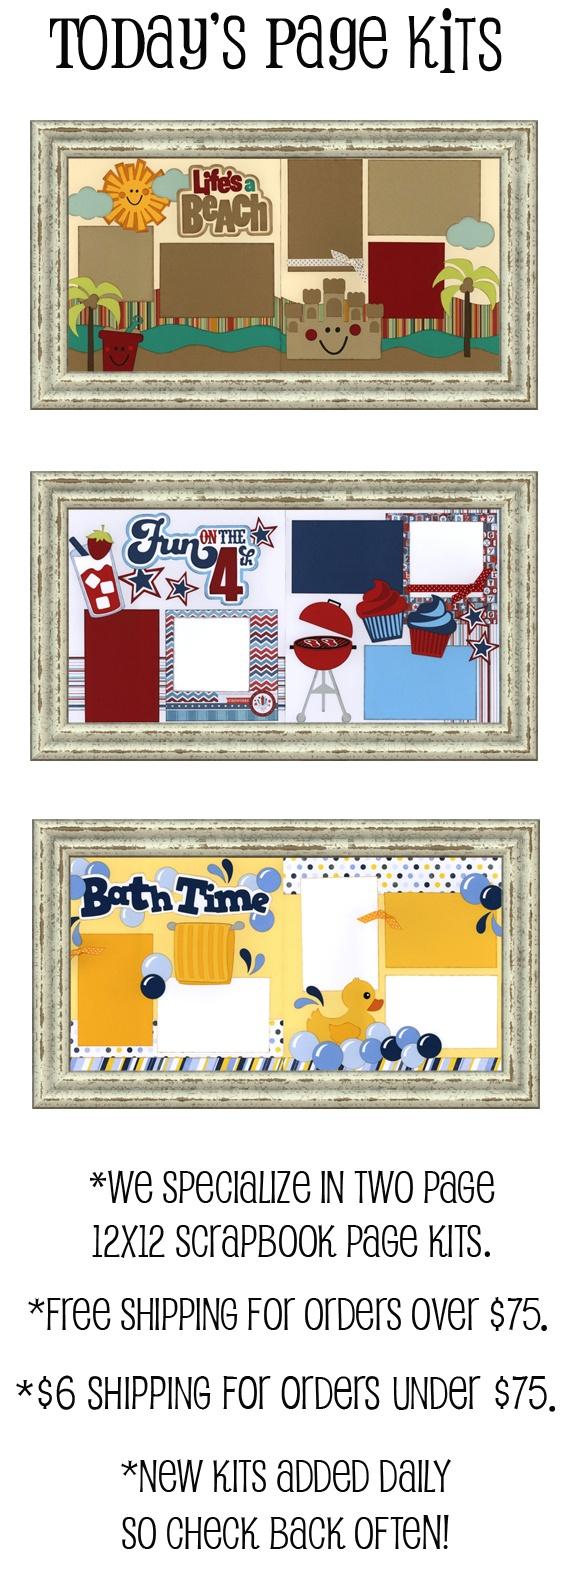 Wedding scrapbook ideas using cricut - Super Cute Scrapbook Page Kits Page Layout Ideas